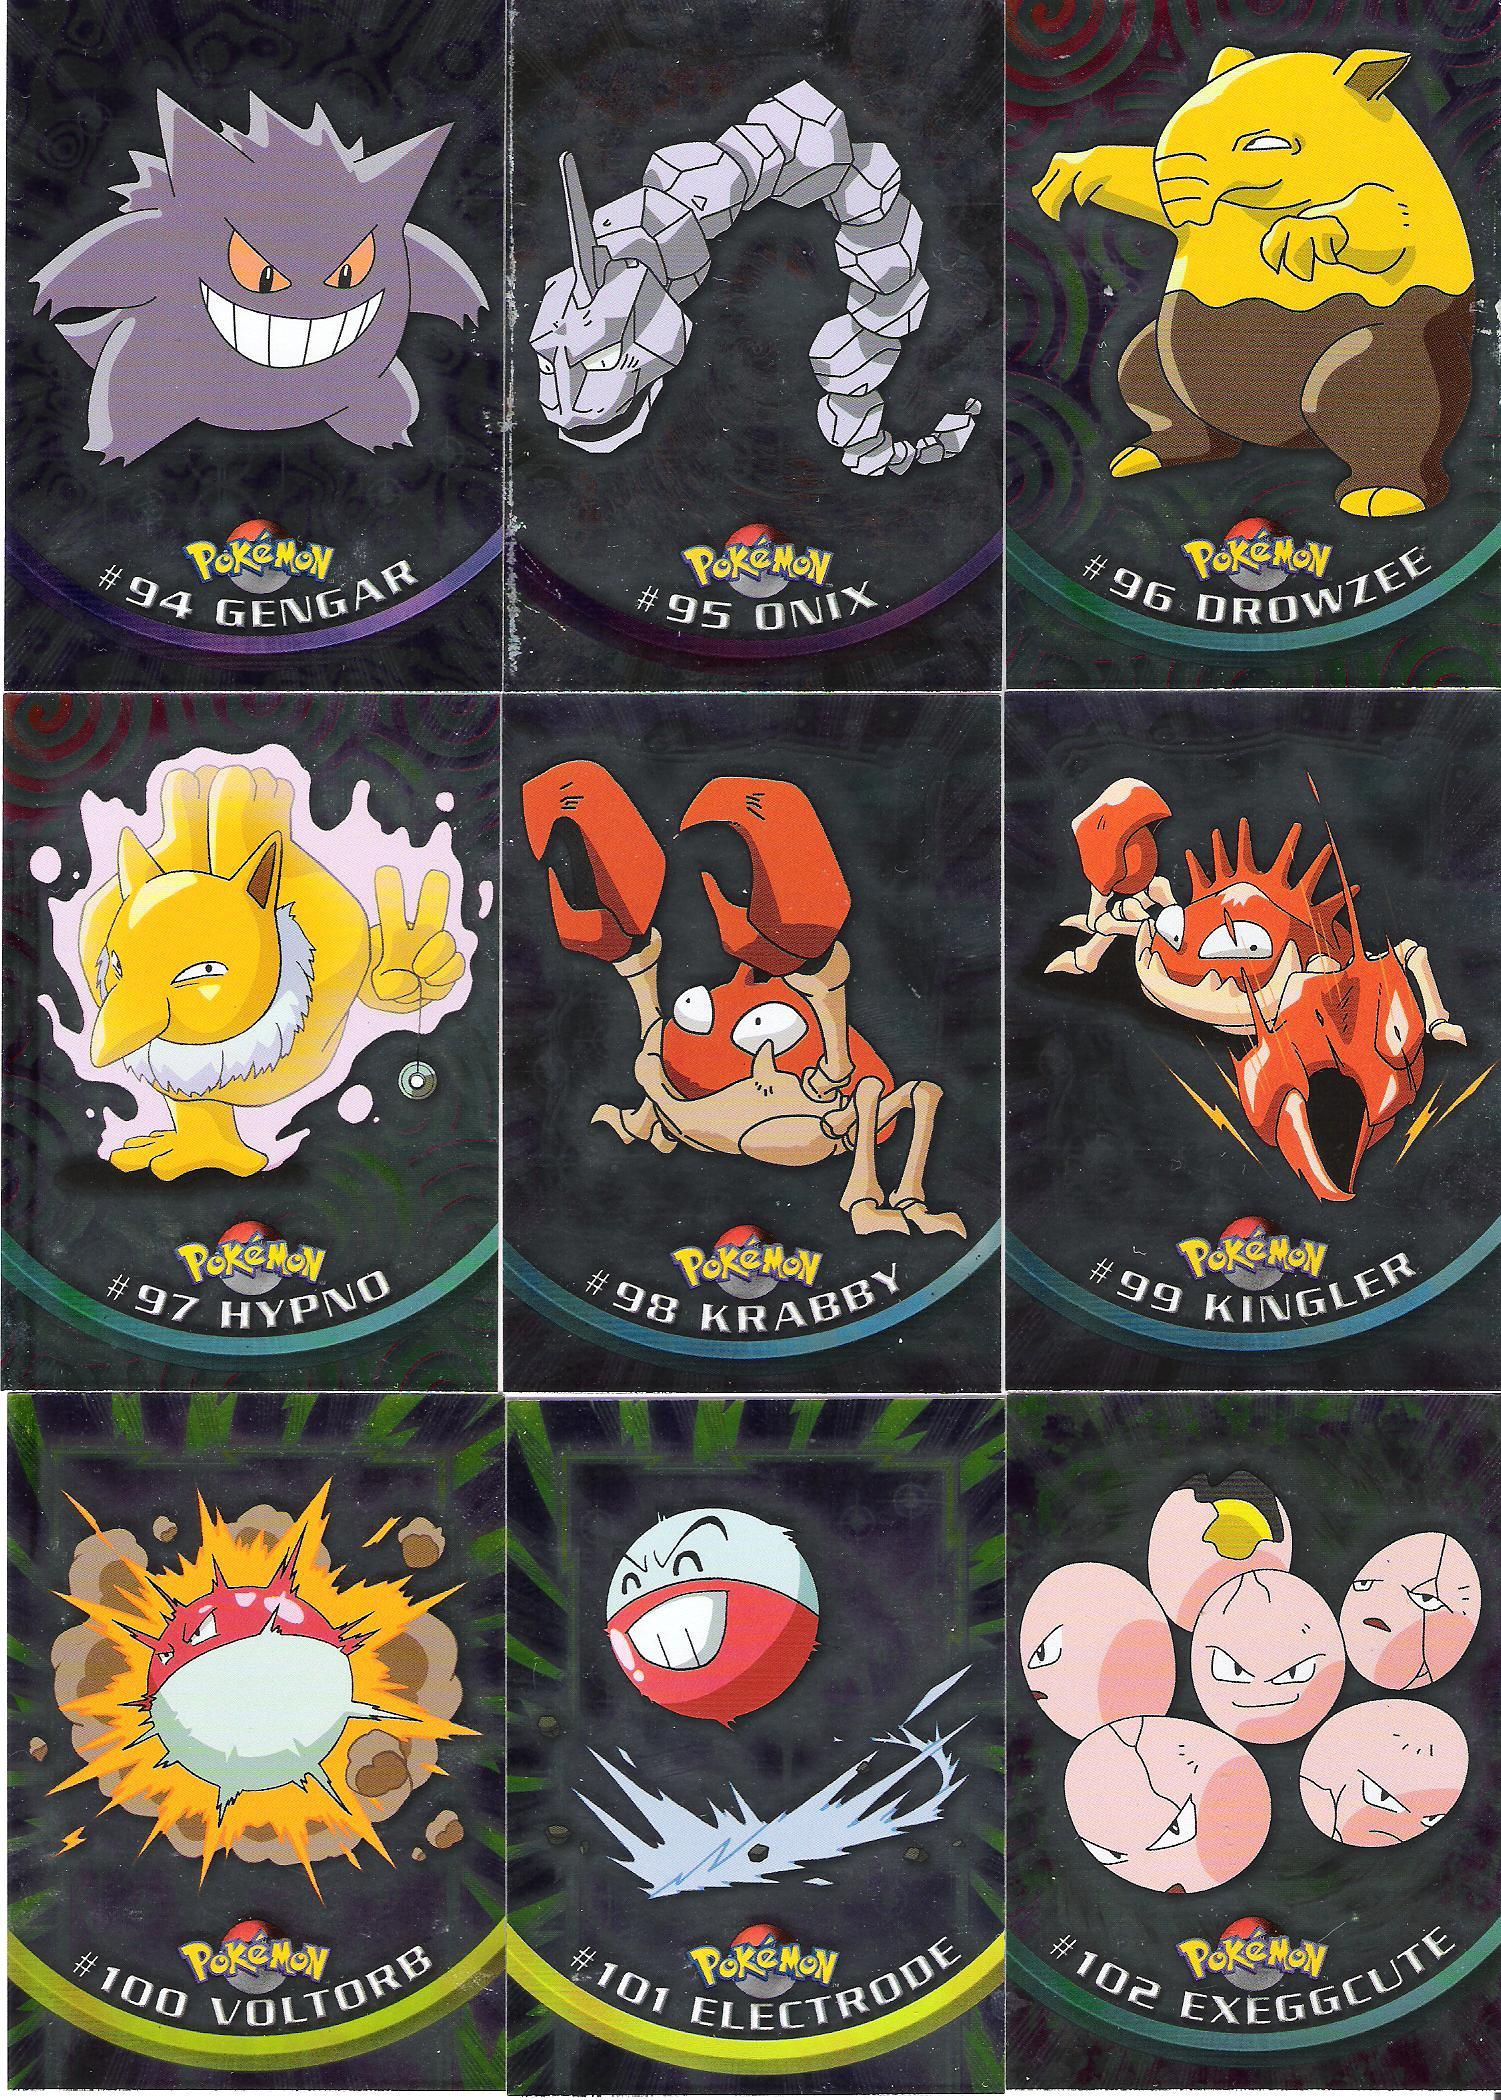 POKEMON TOPPS SERIES 2 SET OF 72 CARDS